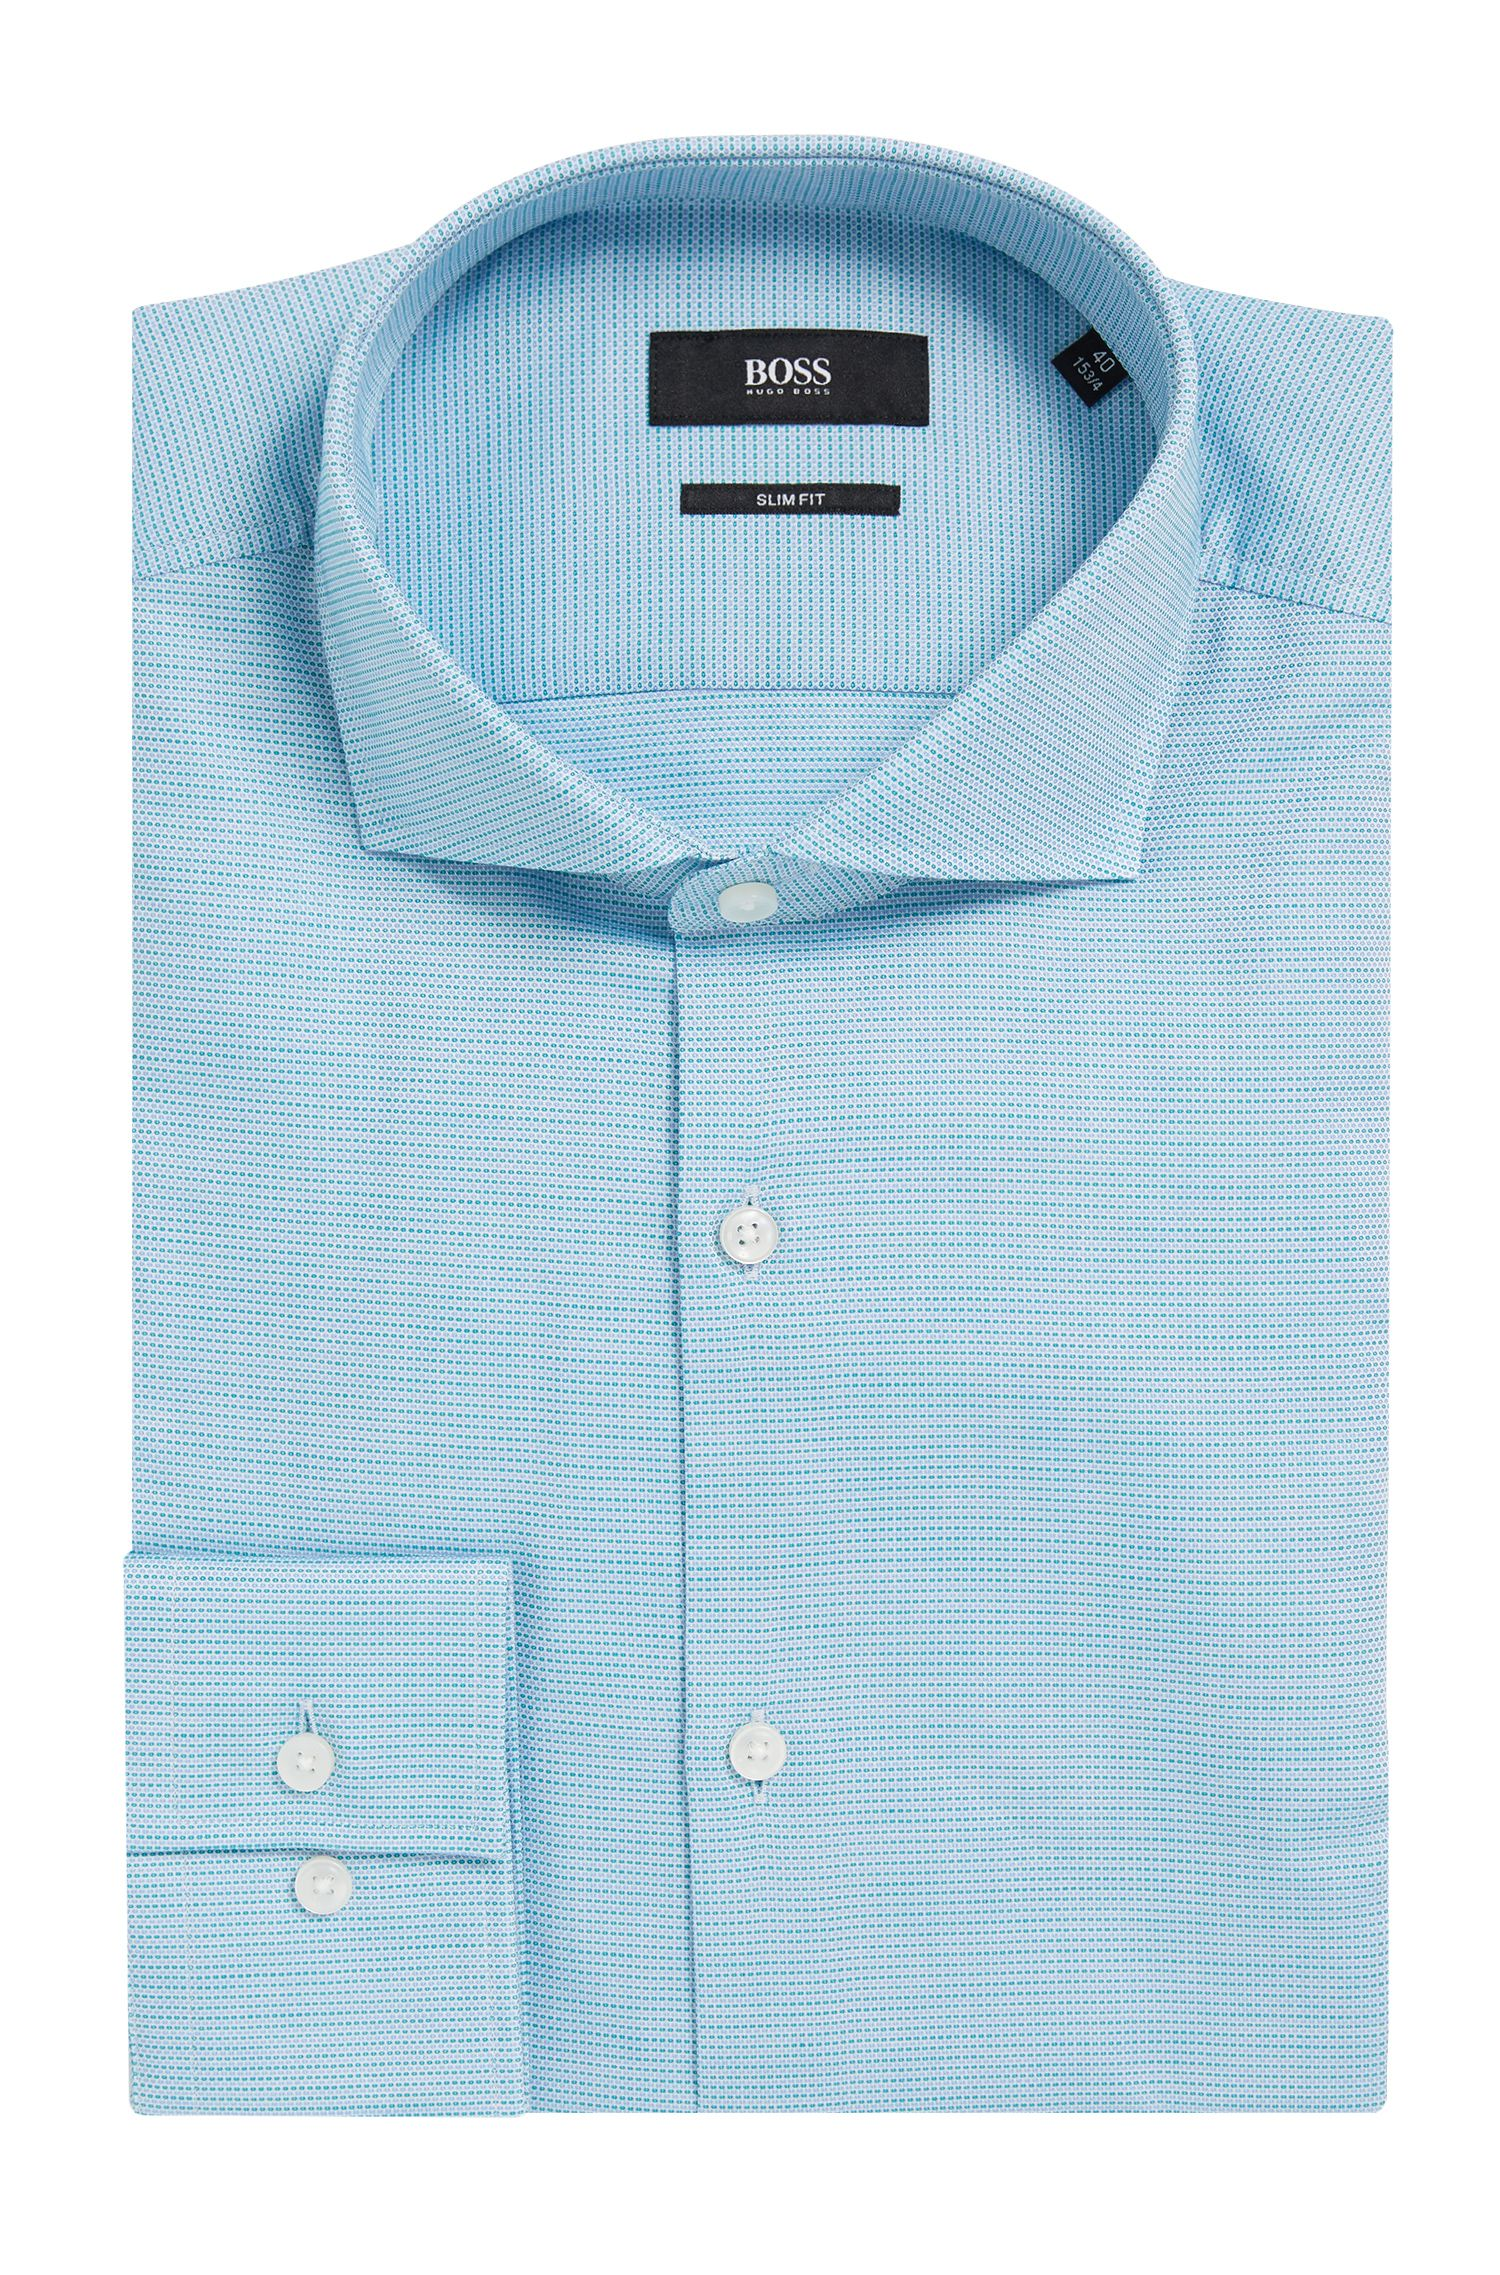 'Jason'   Slim Fit, Nailhead Cotton Dress Shirt